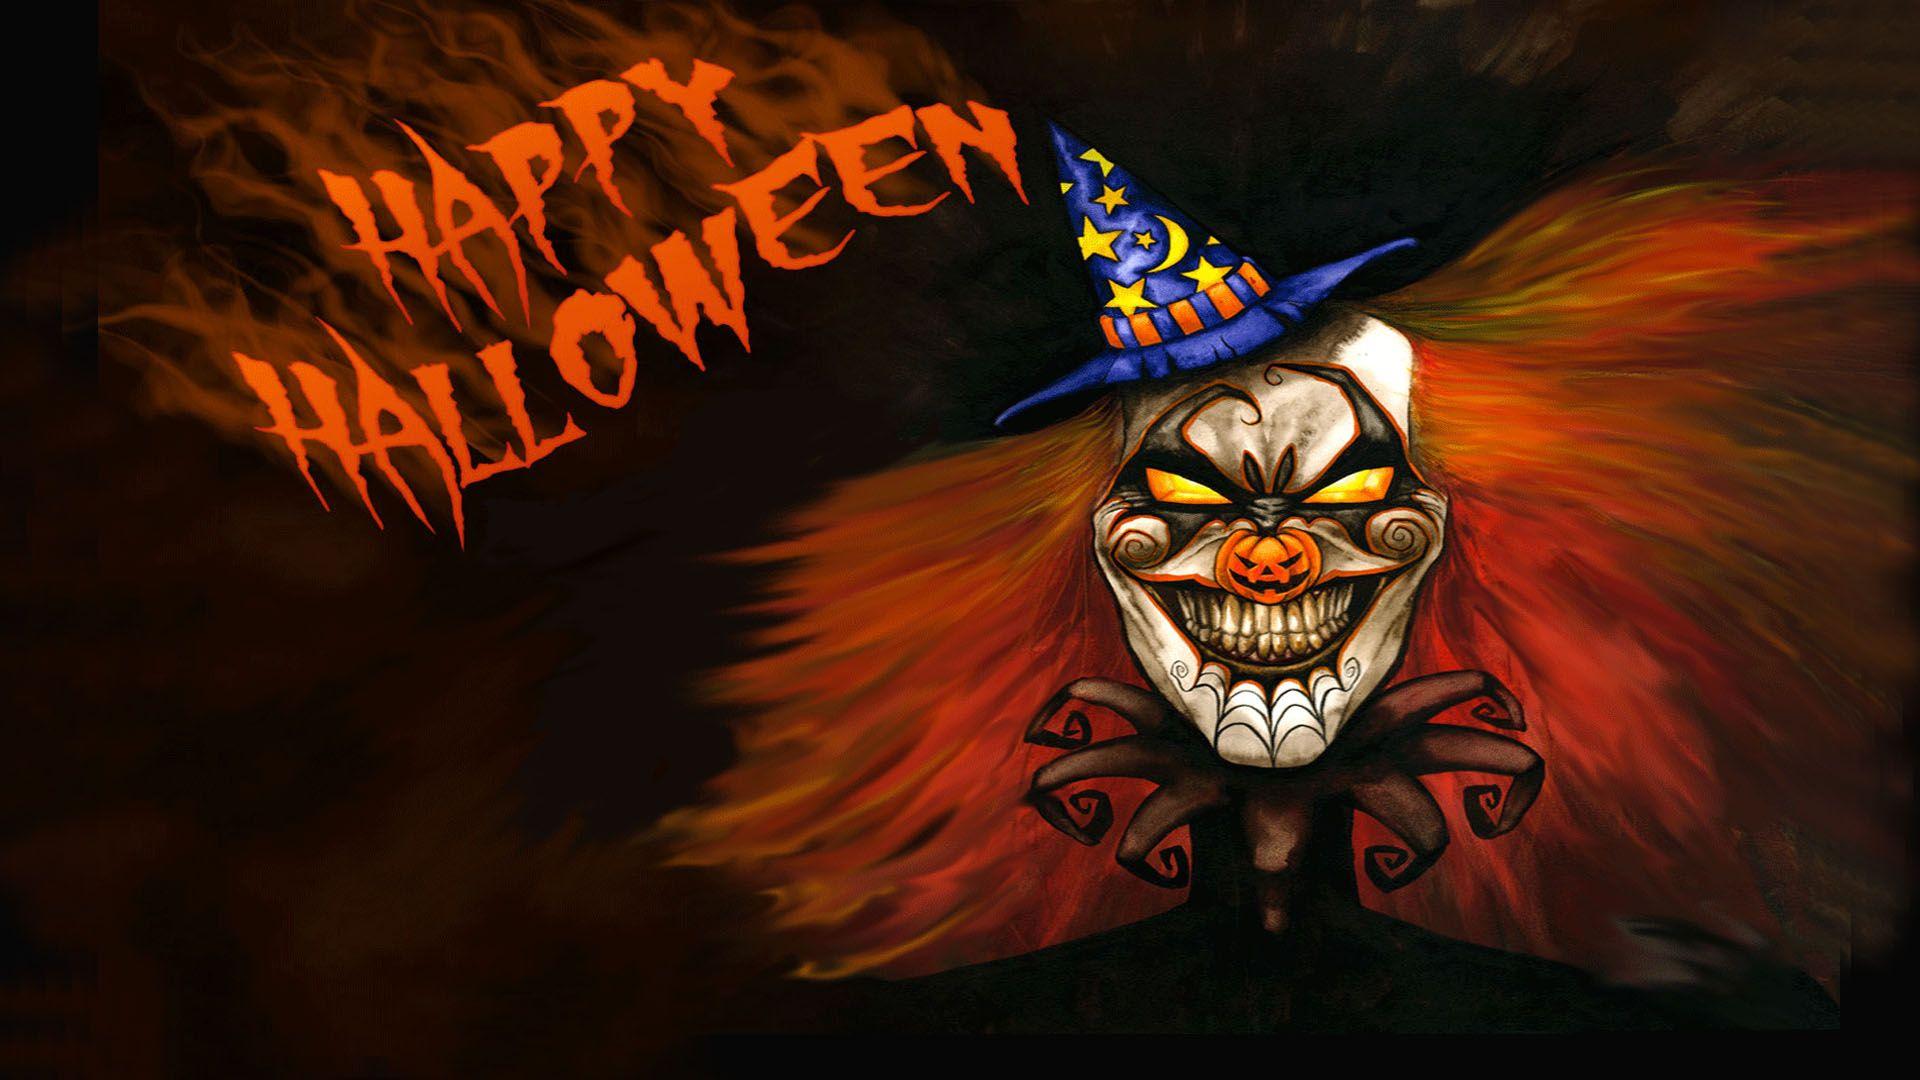 Good Wallpaper Halloween Pinterest - af5eb93cb2c203e464cbc3fa93035f63  You Should Have_98135.jpg